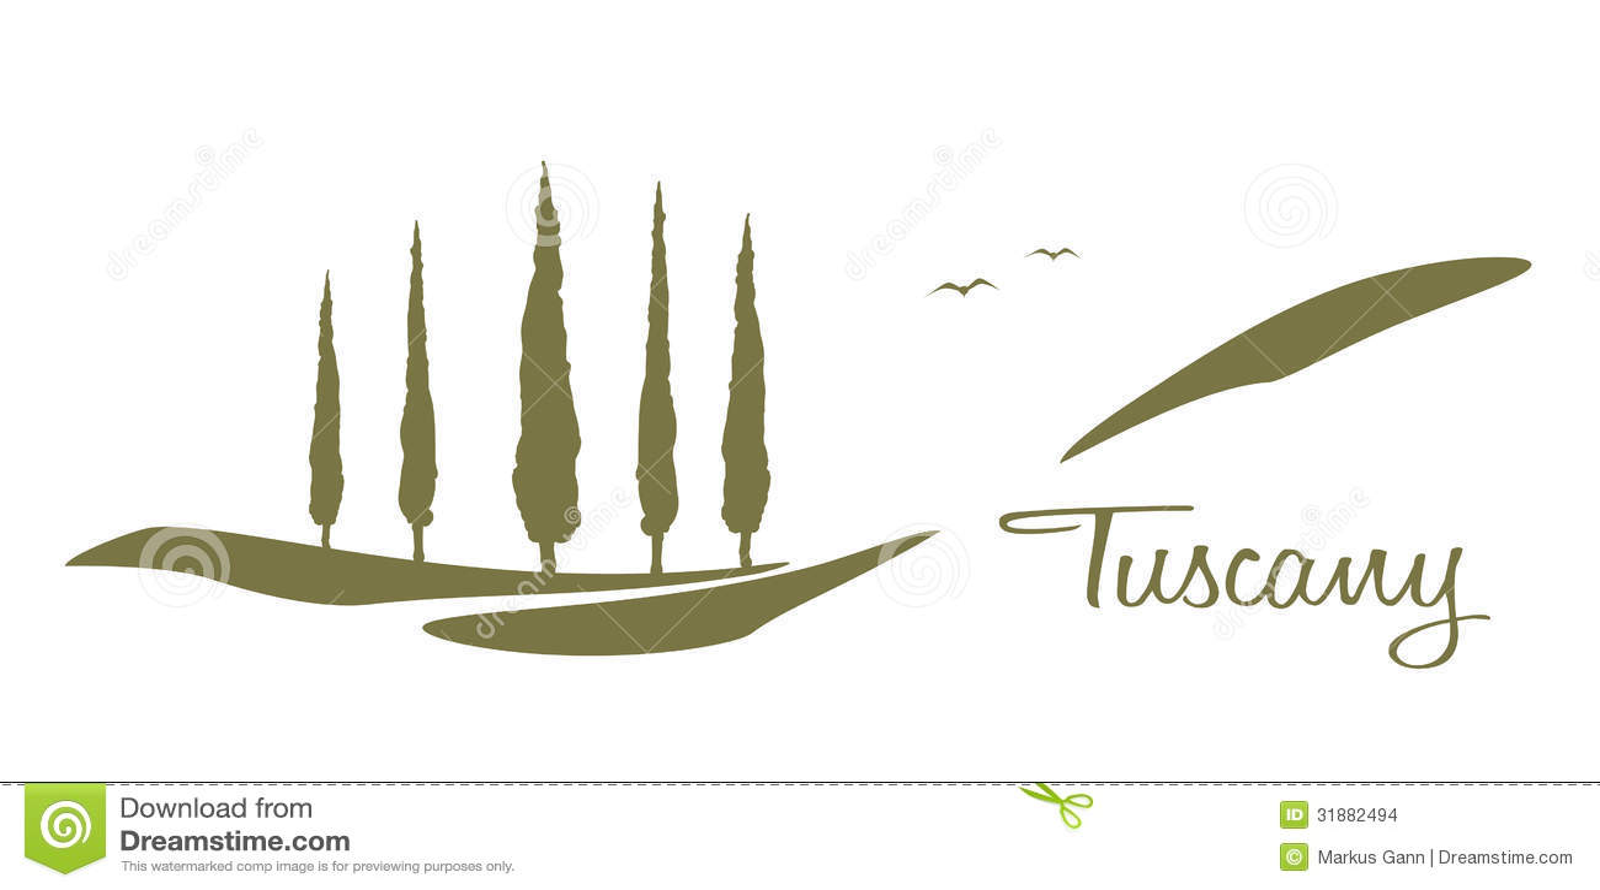 Tuscany graphic stock illustration Illustration of farm